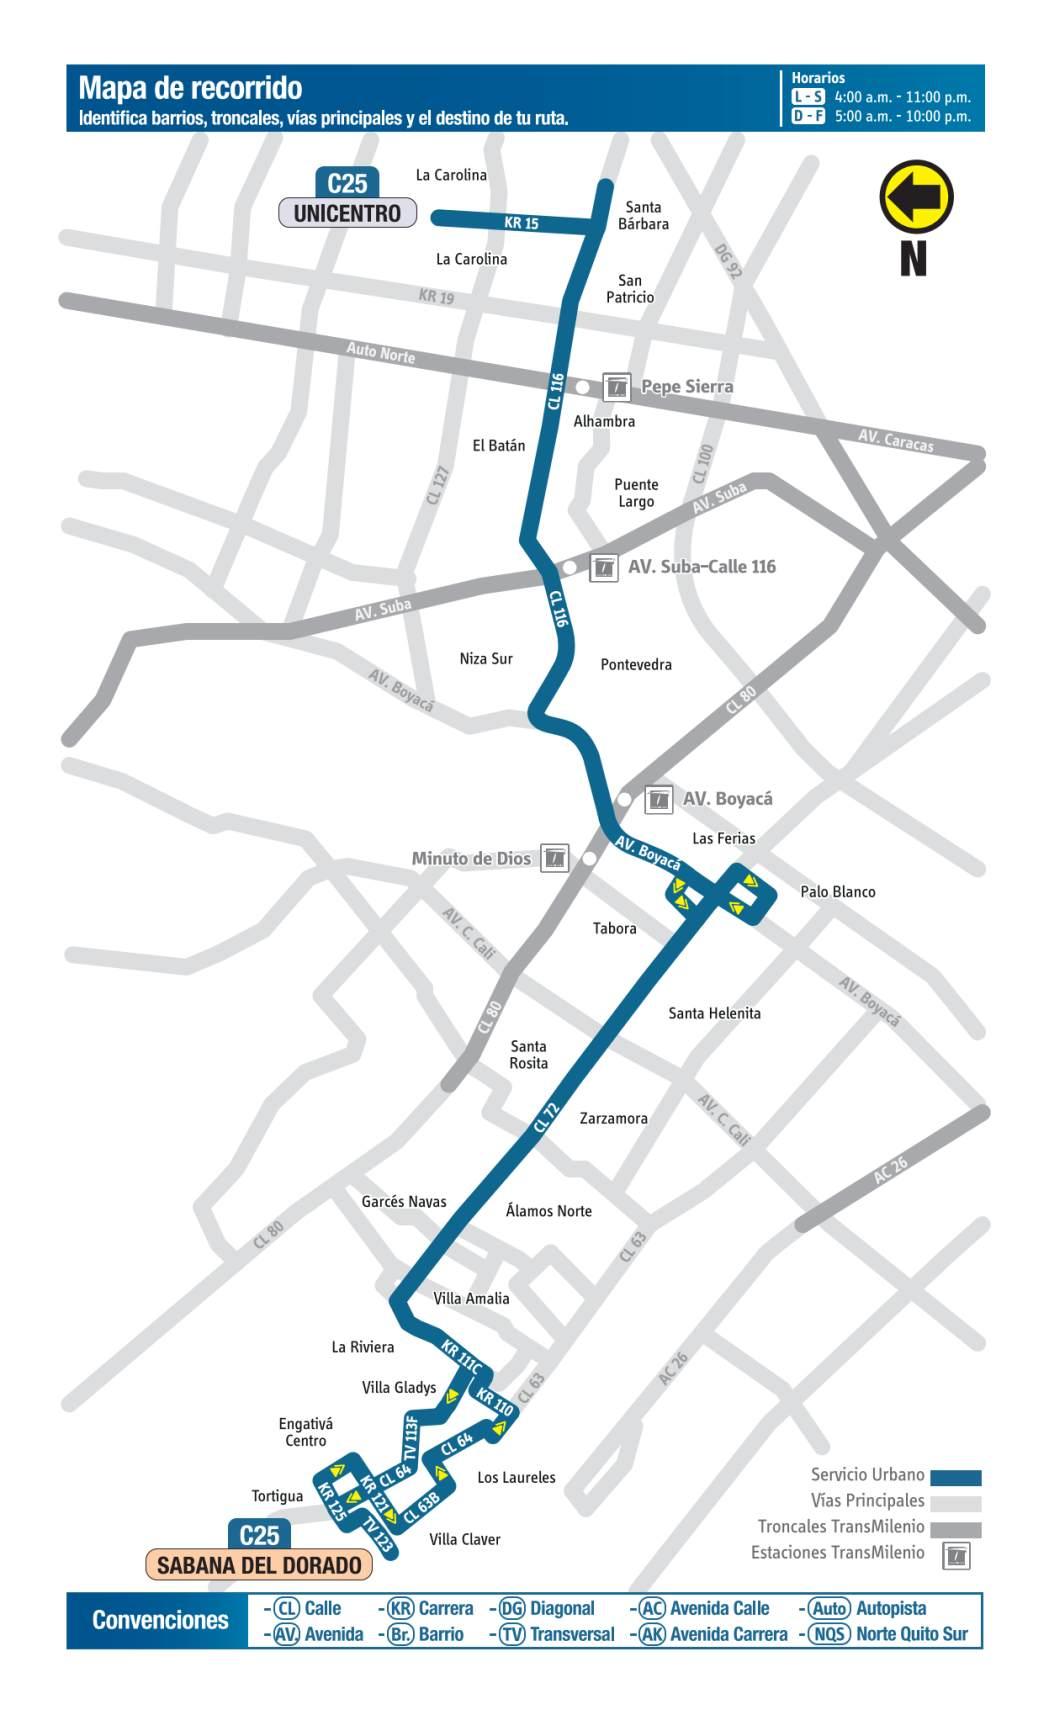 C25 Sabana del Dorado - Unicentro, mapa bus urbano Bogotá